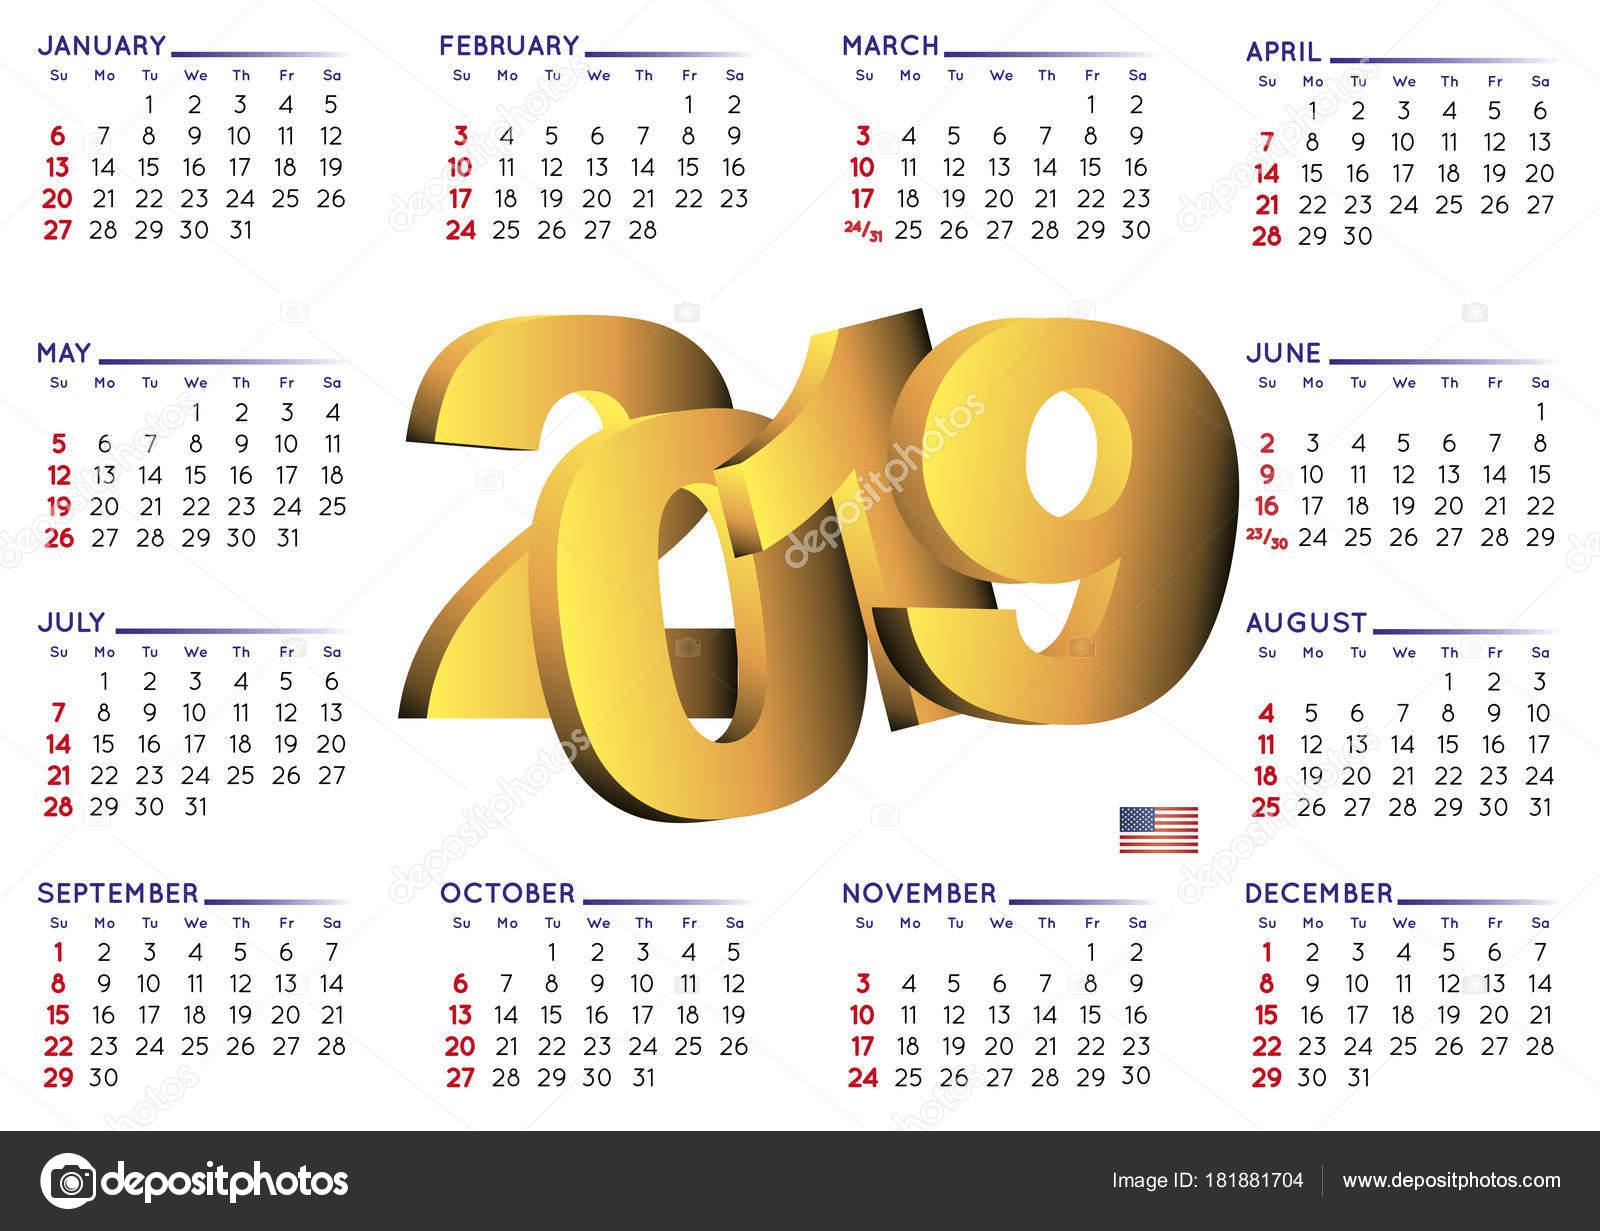 ünnepnapok 2019 naptár 2019 naptár angol vízszintes Usa — Stock Vektor © alfonsodetomas  ünnepnapok 2019 naptár